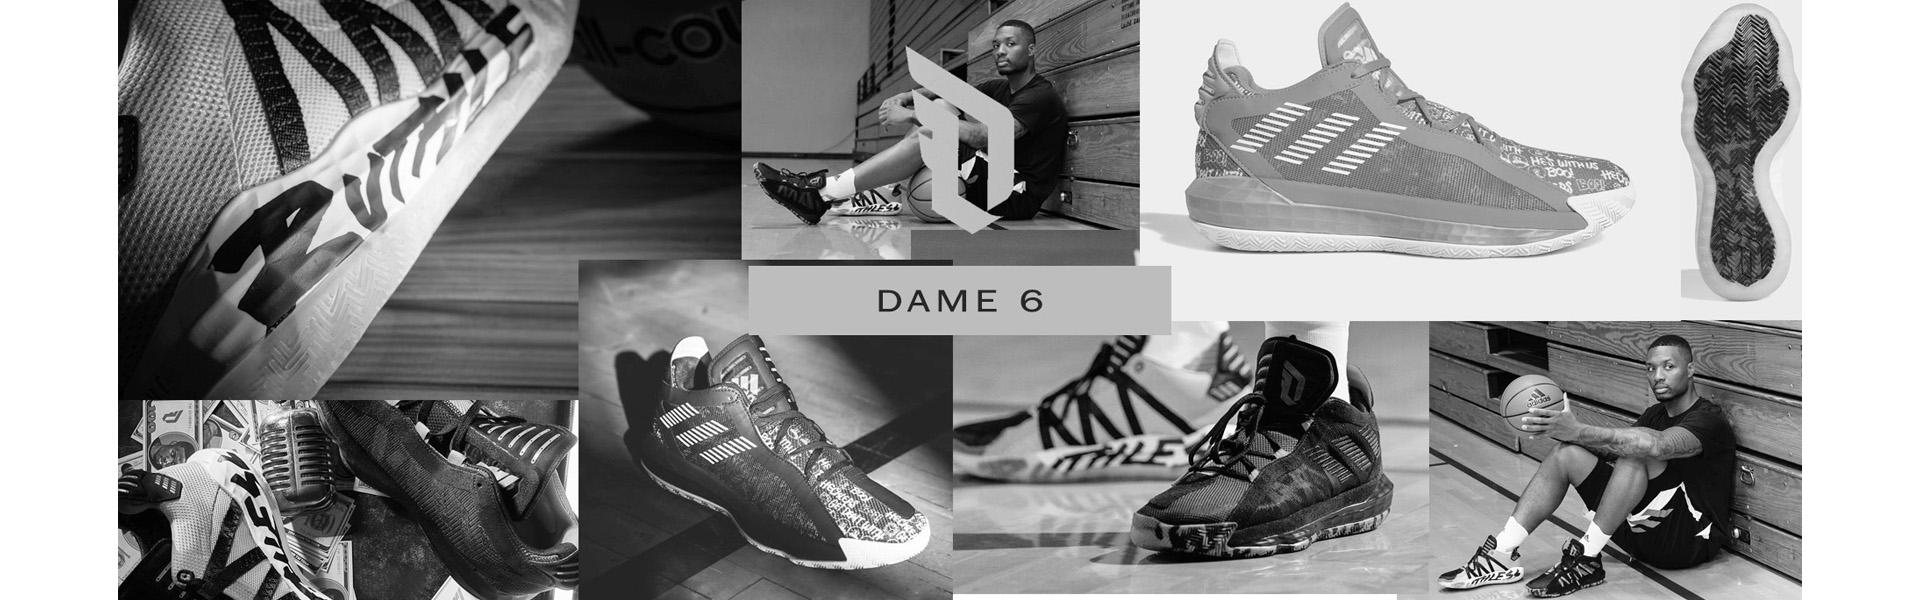 dame-6-banner-2